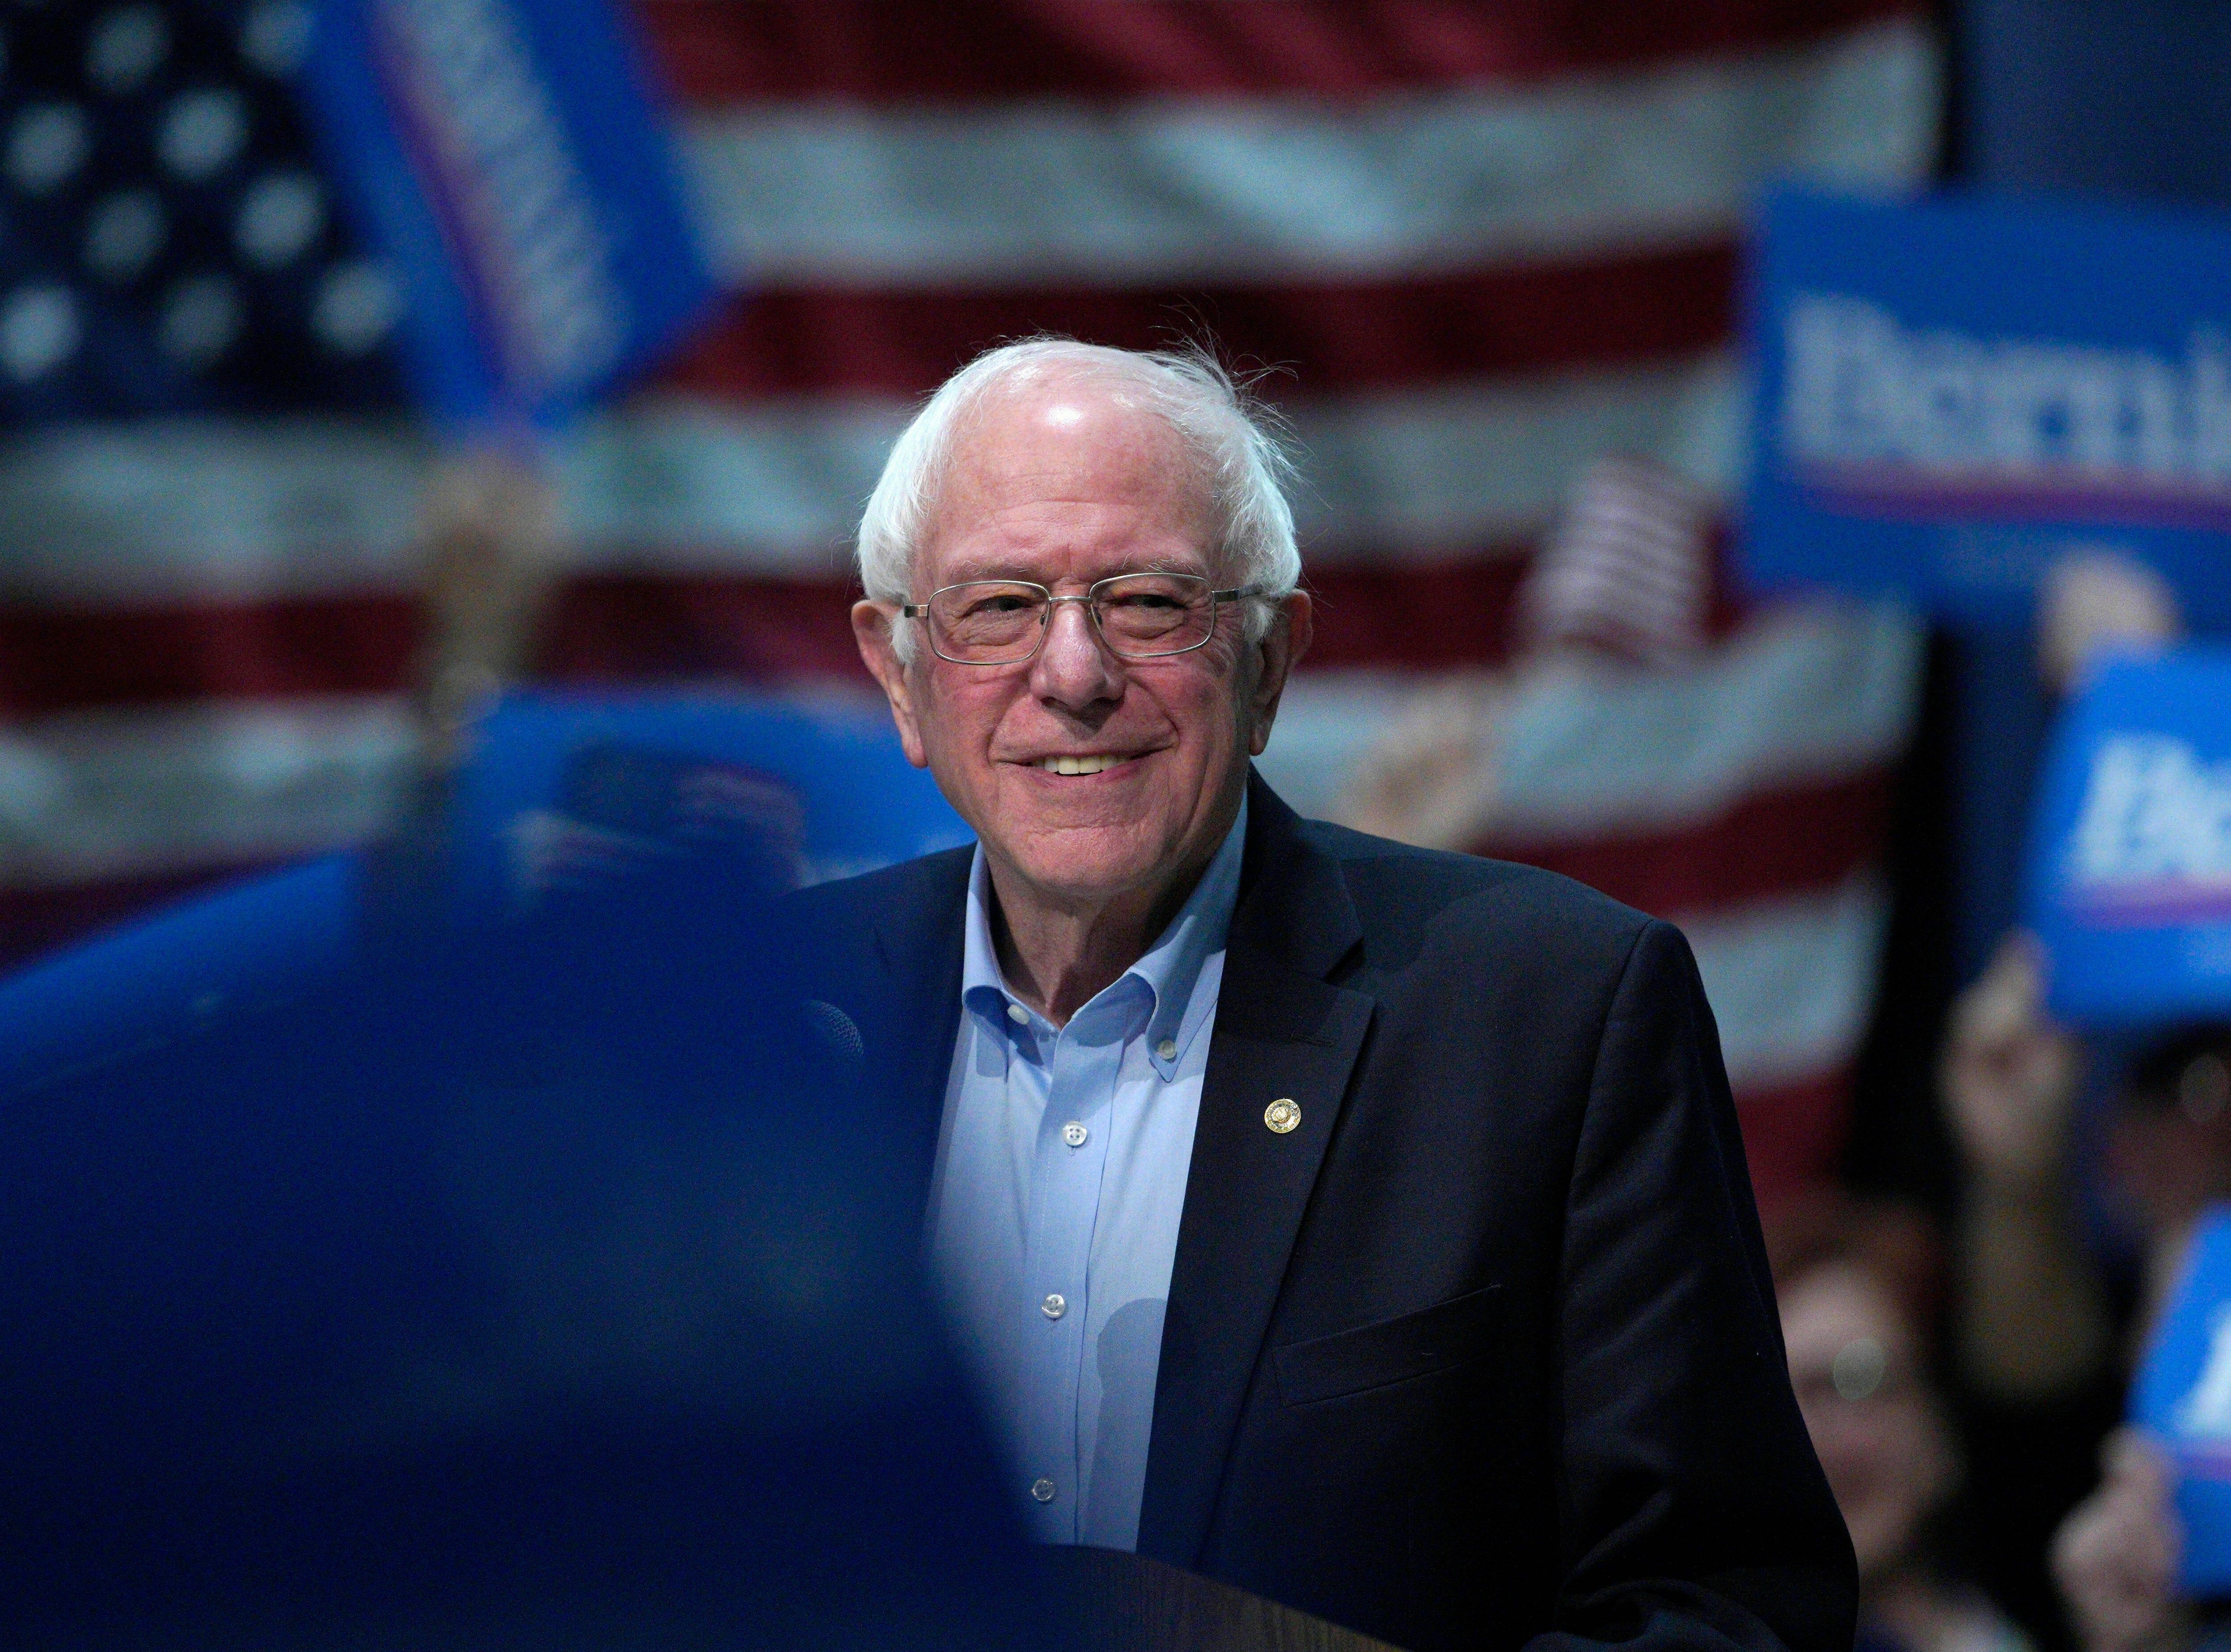 Sen. Bernie Sanders, I-Vt, speaks at a rally in Council Bluffs, Iowa, Thursday, March 7, 2019.